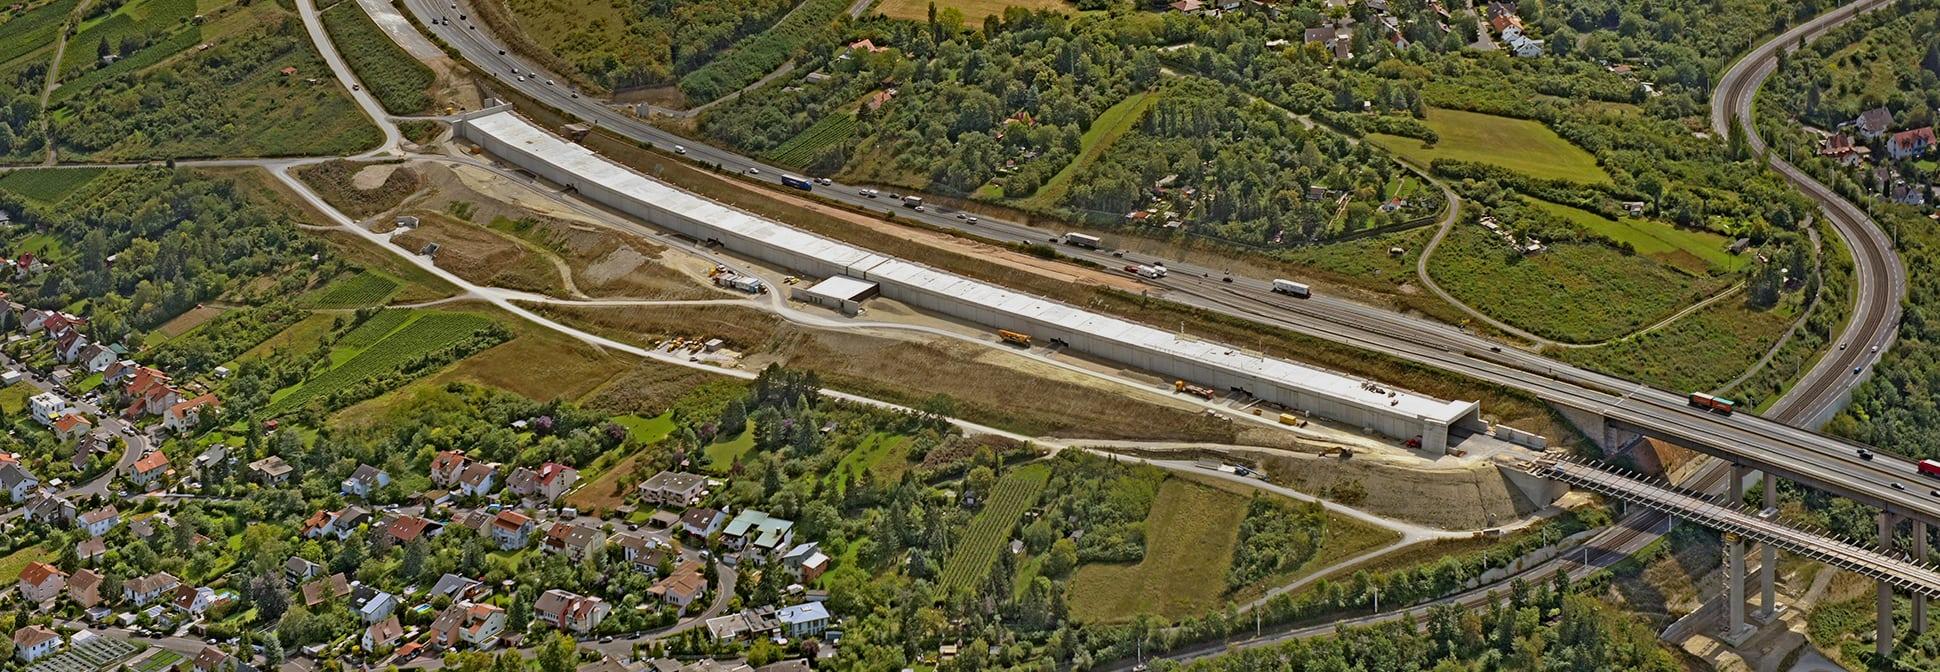 Katzenbergtunnel A3 Würzburg Zugang